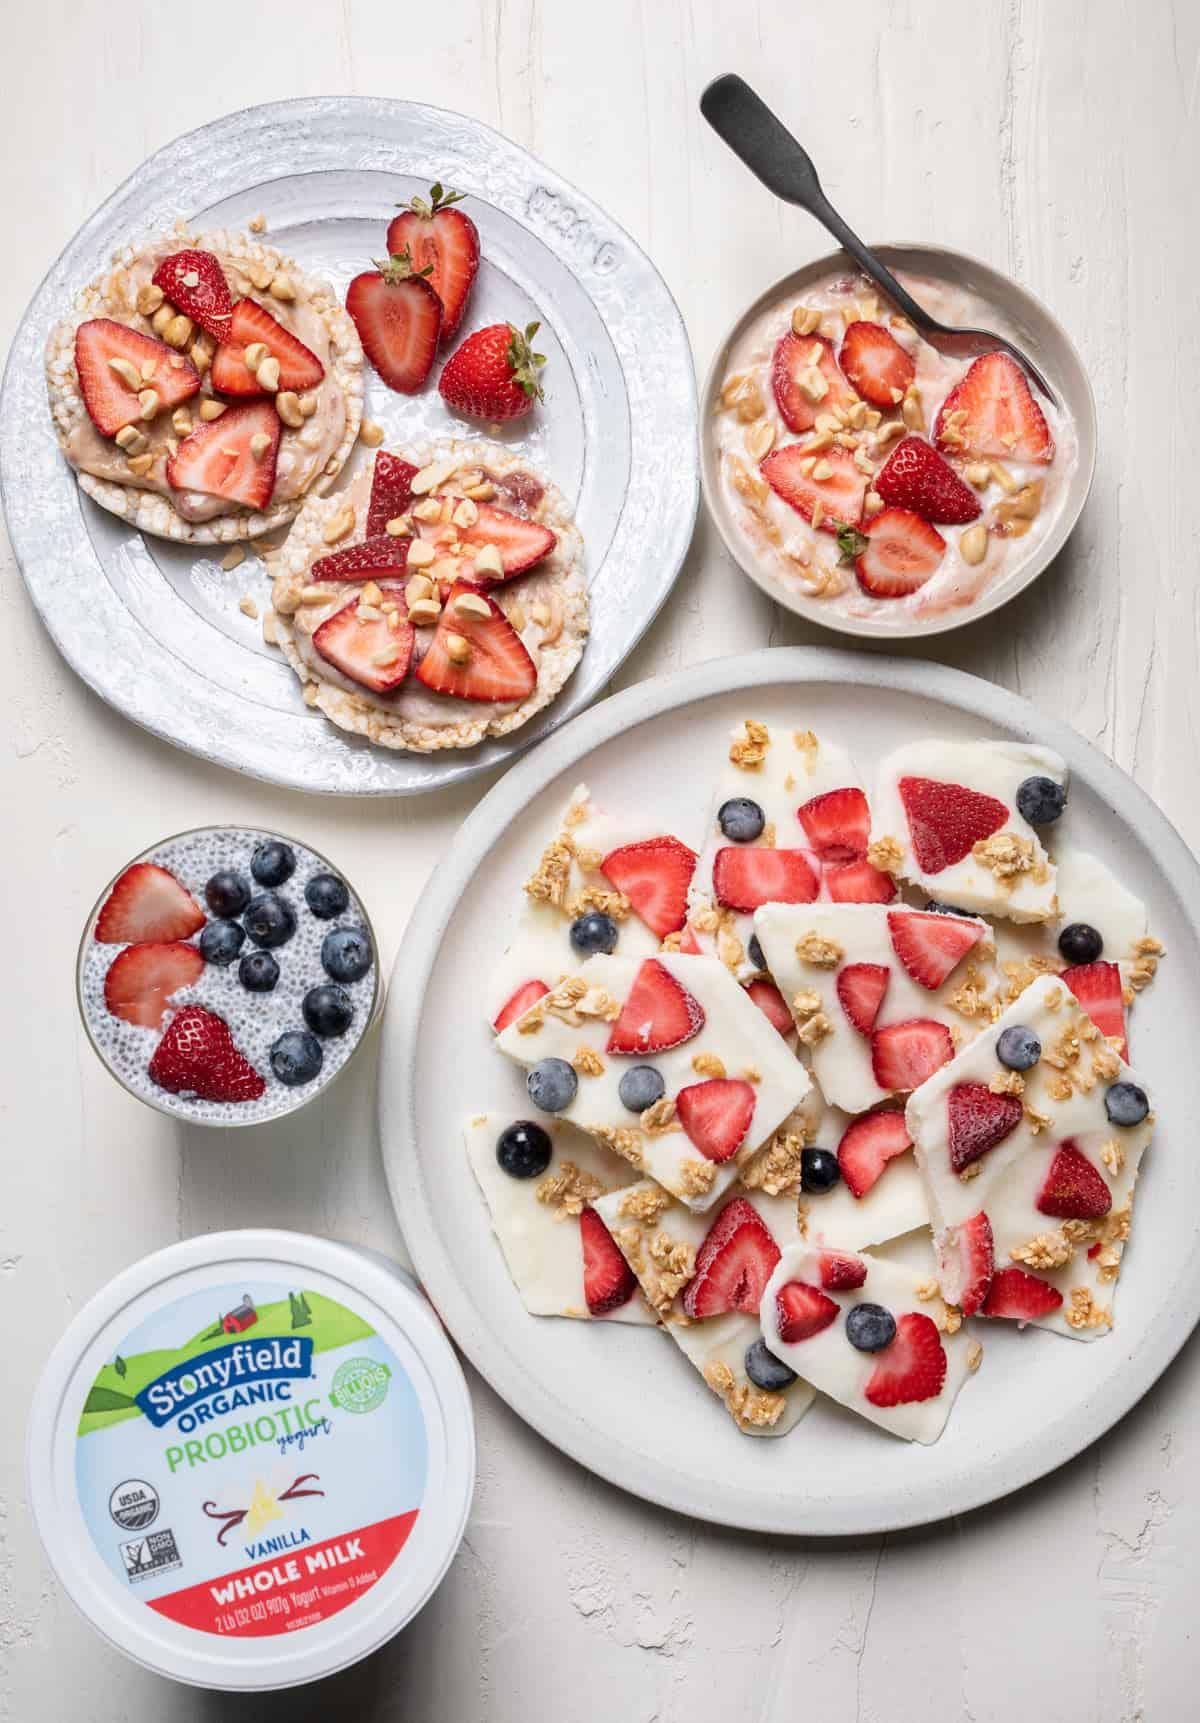 Variety of berry and yogurt snacks with tub of Stonyfield yogurt